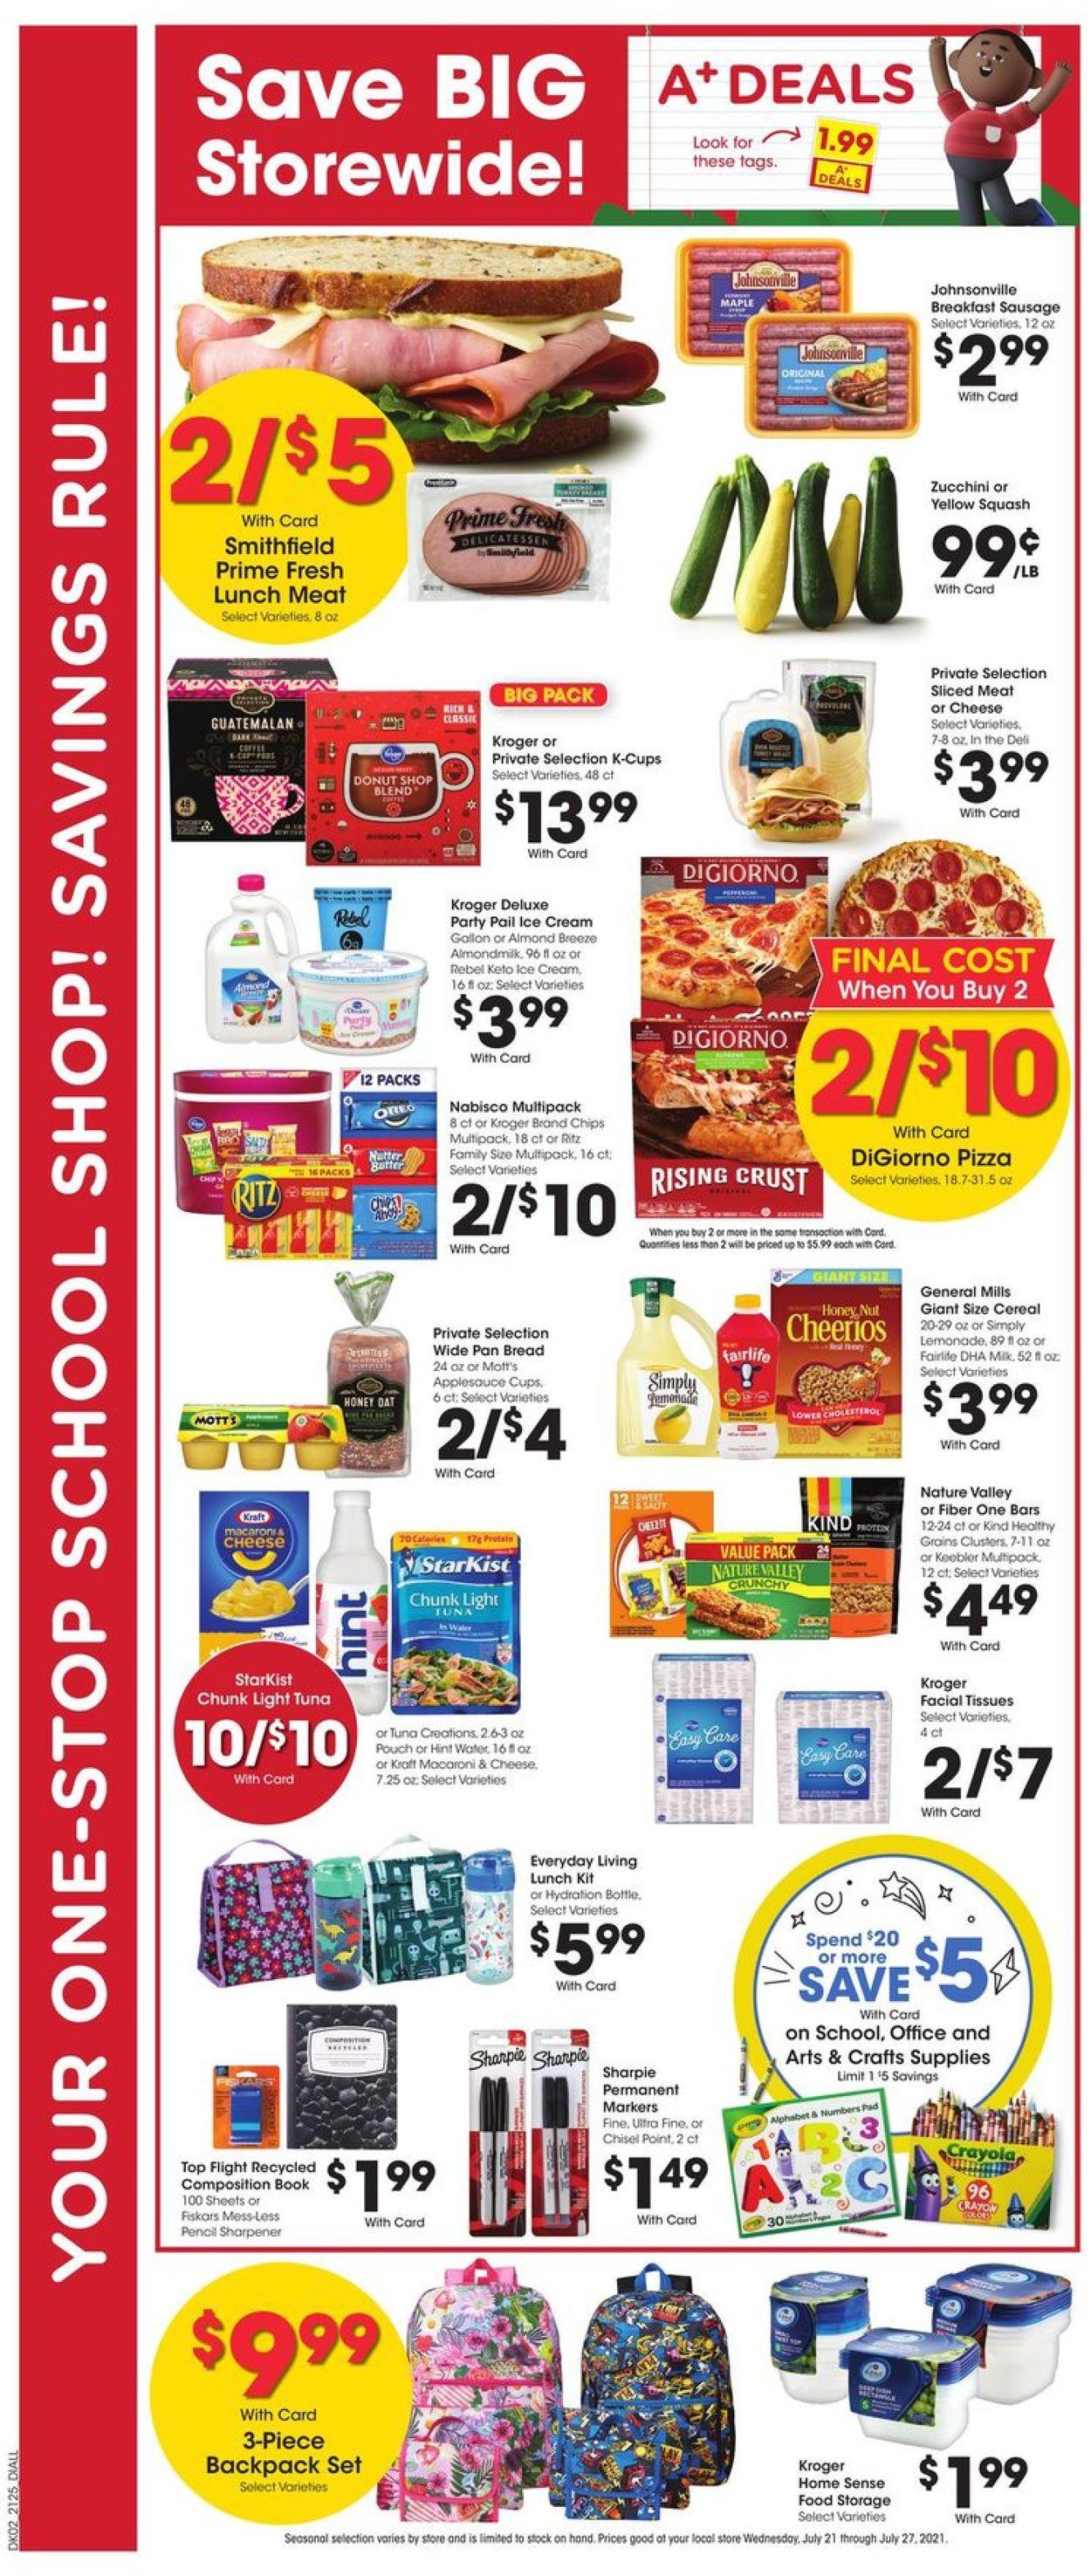 Gerbes Super Markets Weekly Ad Circular - valid 07/21-07/27/2021 (Page 4)